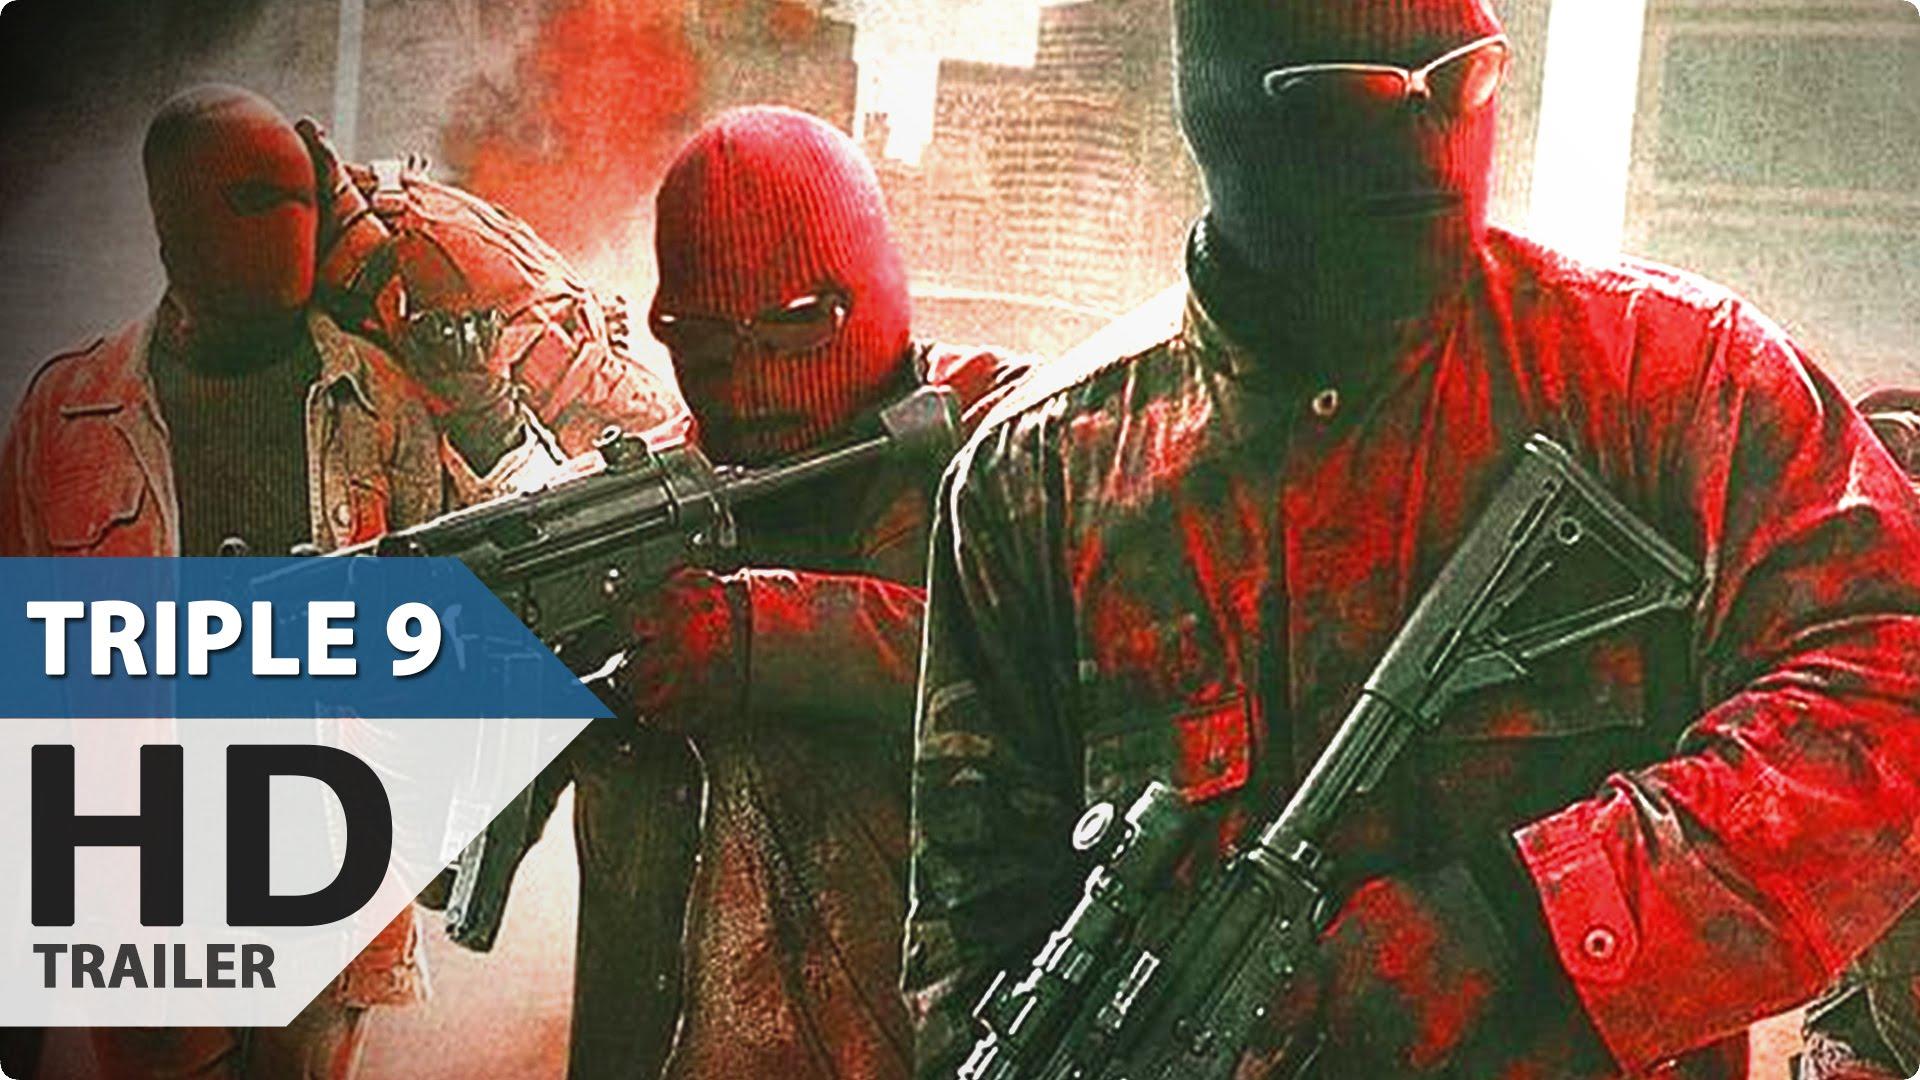 Triple 9 Red Band Trailer (2016) Aaron Paul, Norman Reedus, Anthony Mackie | Heist Movie